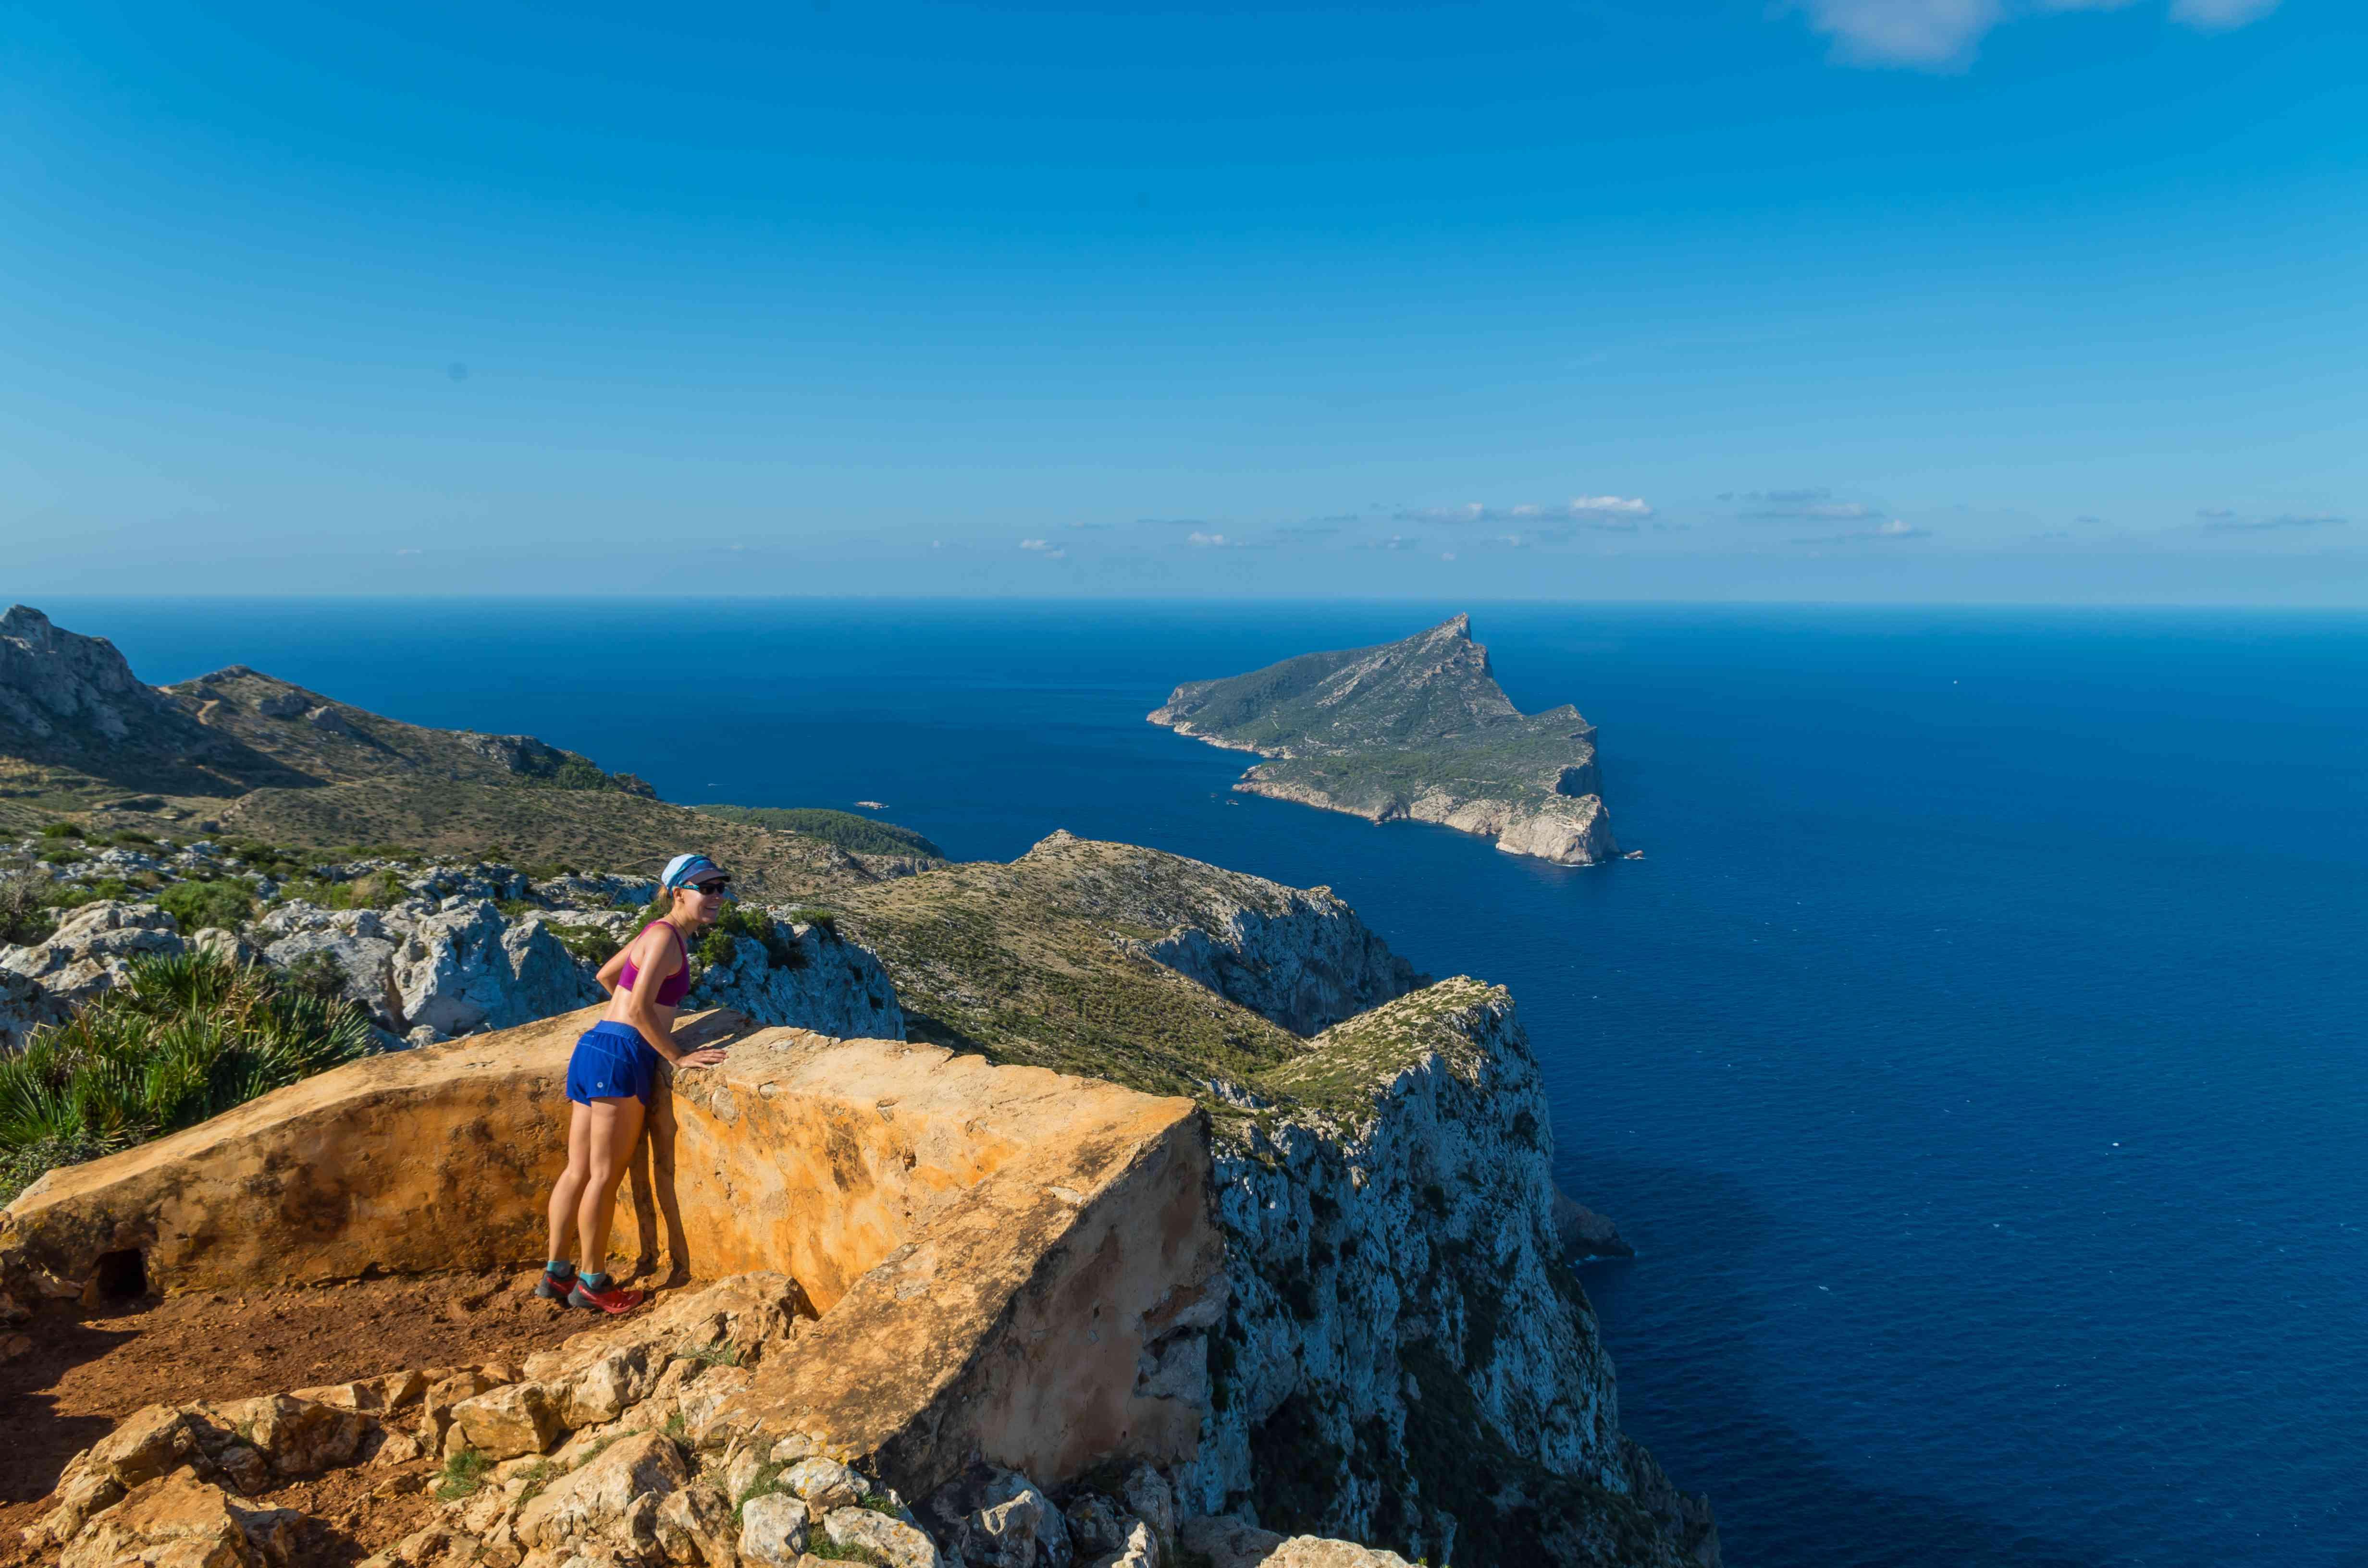 Hiking on the GR 221, Mallorca, La Dragonera in background